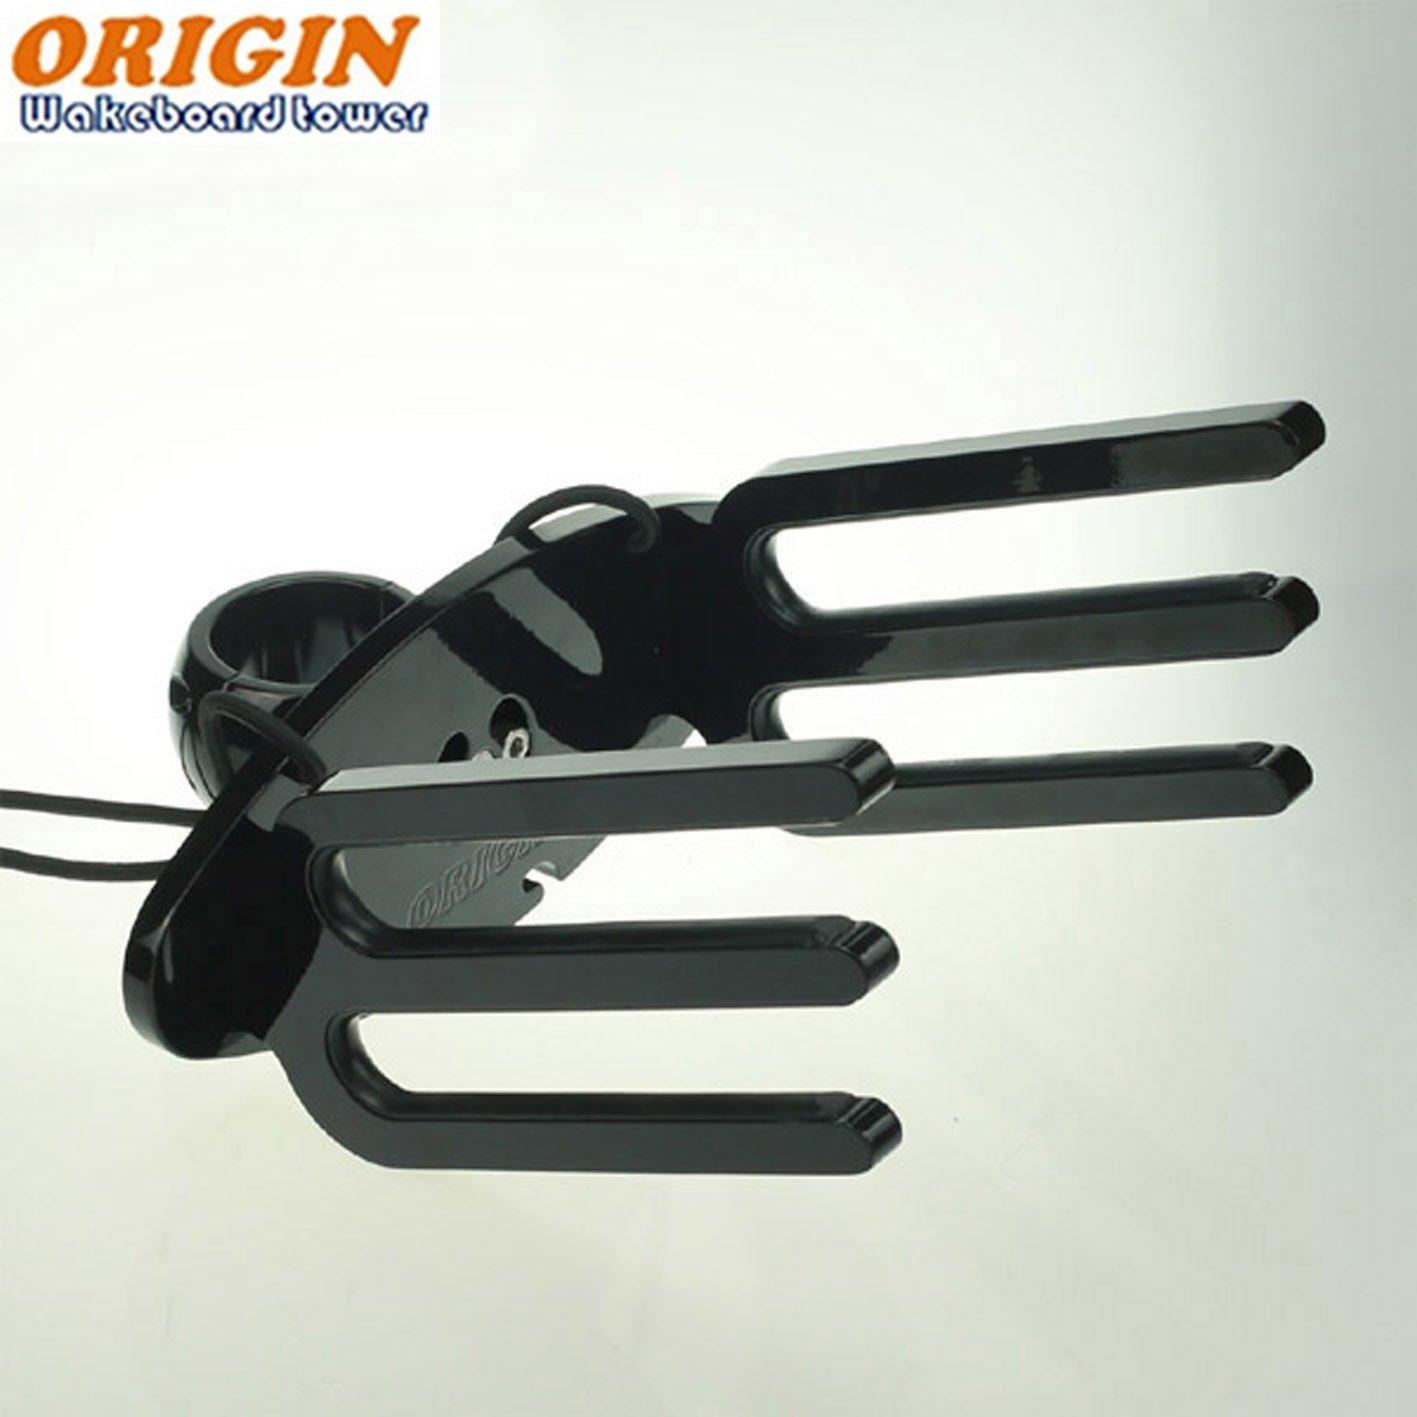 Origin Owt-wwi Wakeboard Tour Rack Noir brillant ajustement horizontal/vertical/Slant Tube